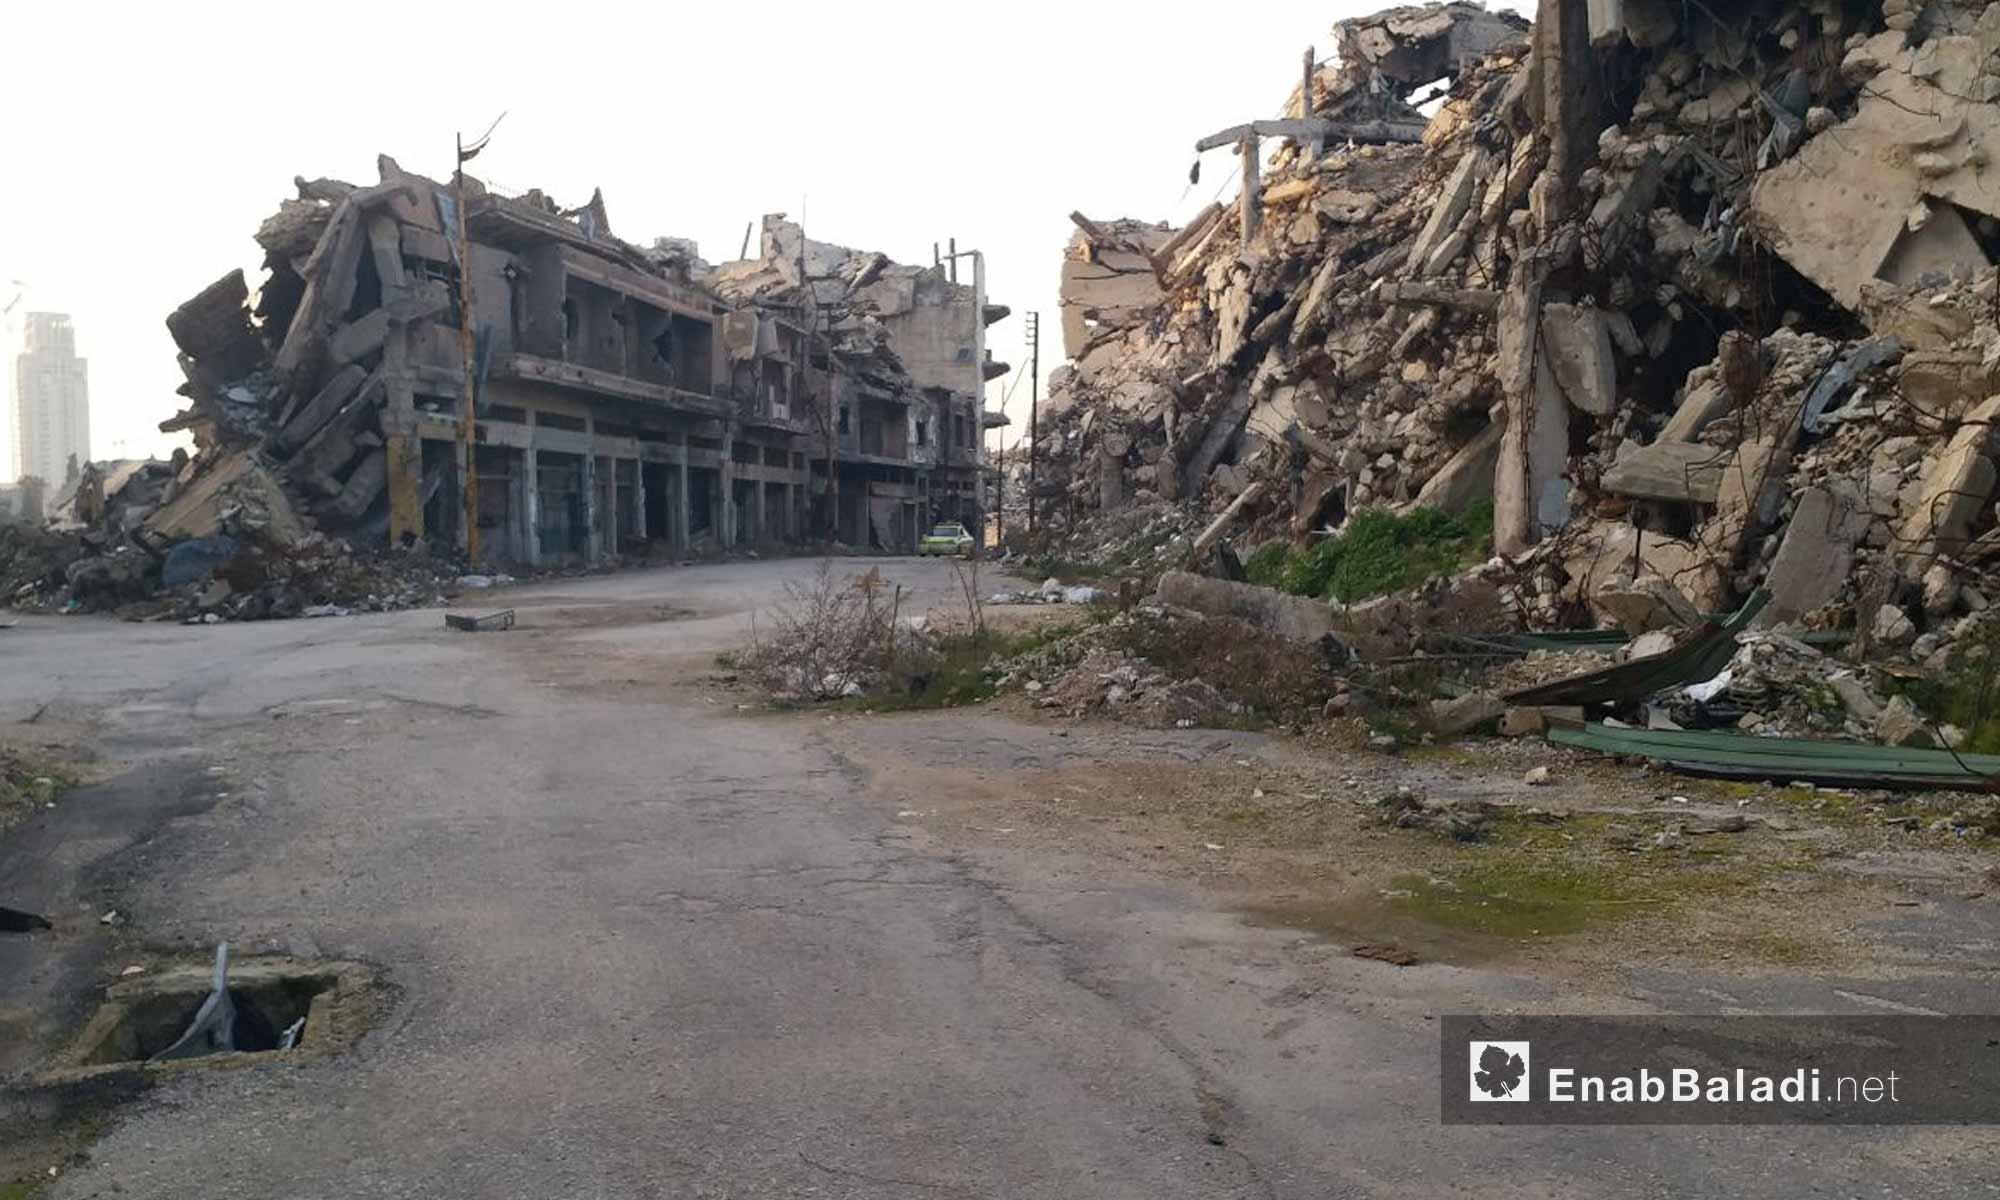 Hama roadway and the surrounding of Khalid ibn al-Walid Mosque, Homs – January 24, 2019 (Enab Baladi)